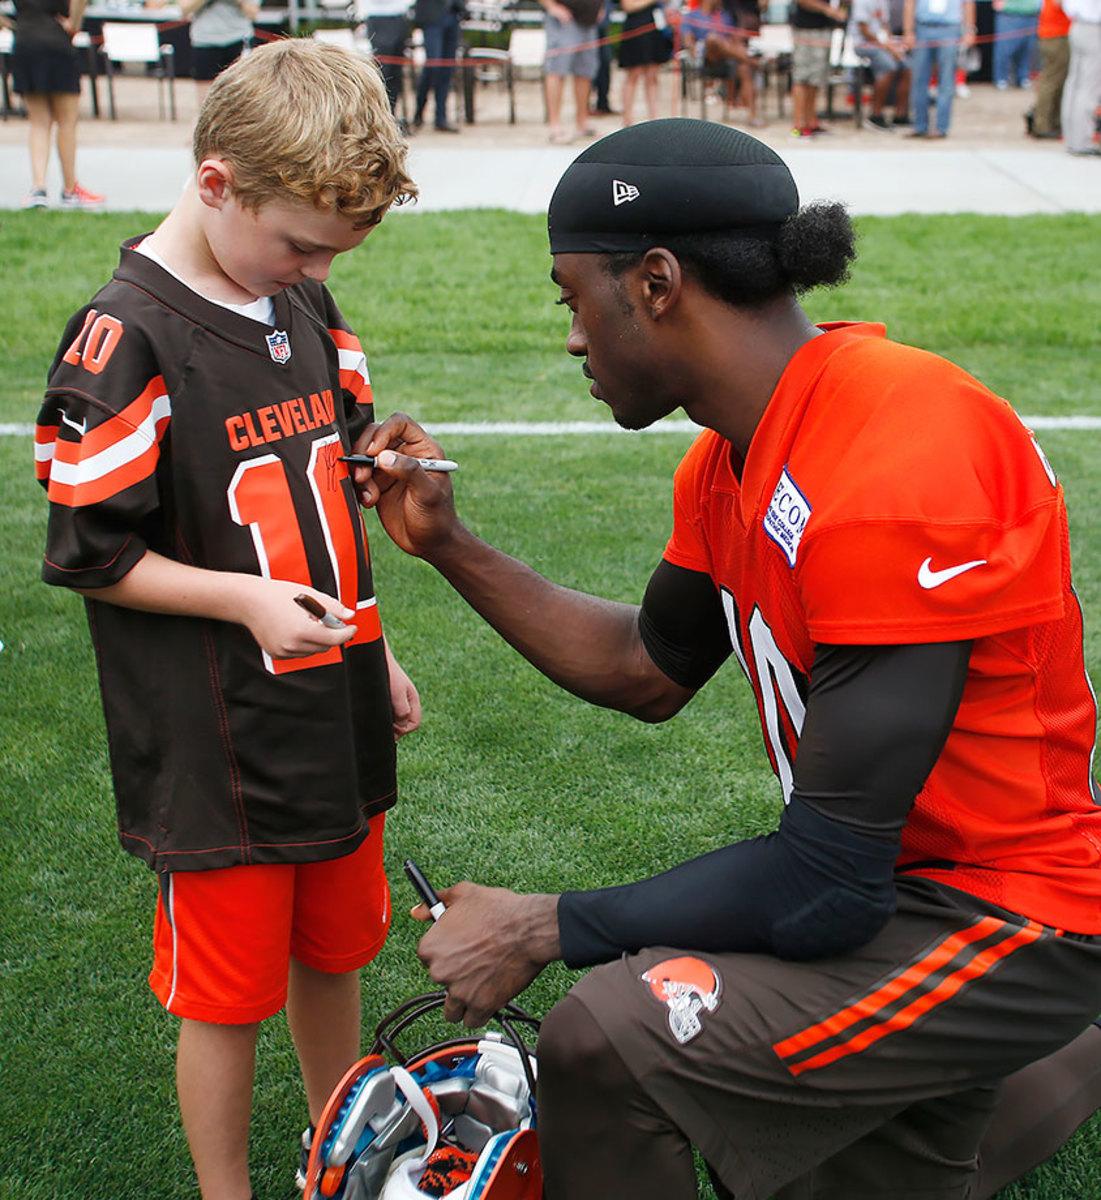 2016-0729-Cleveland-Browns-training-camp-Robert-Griffin-III.jpg